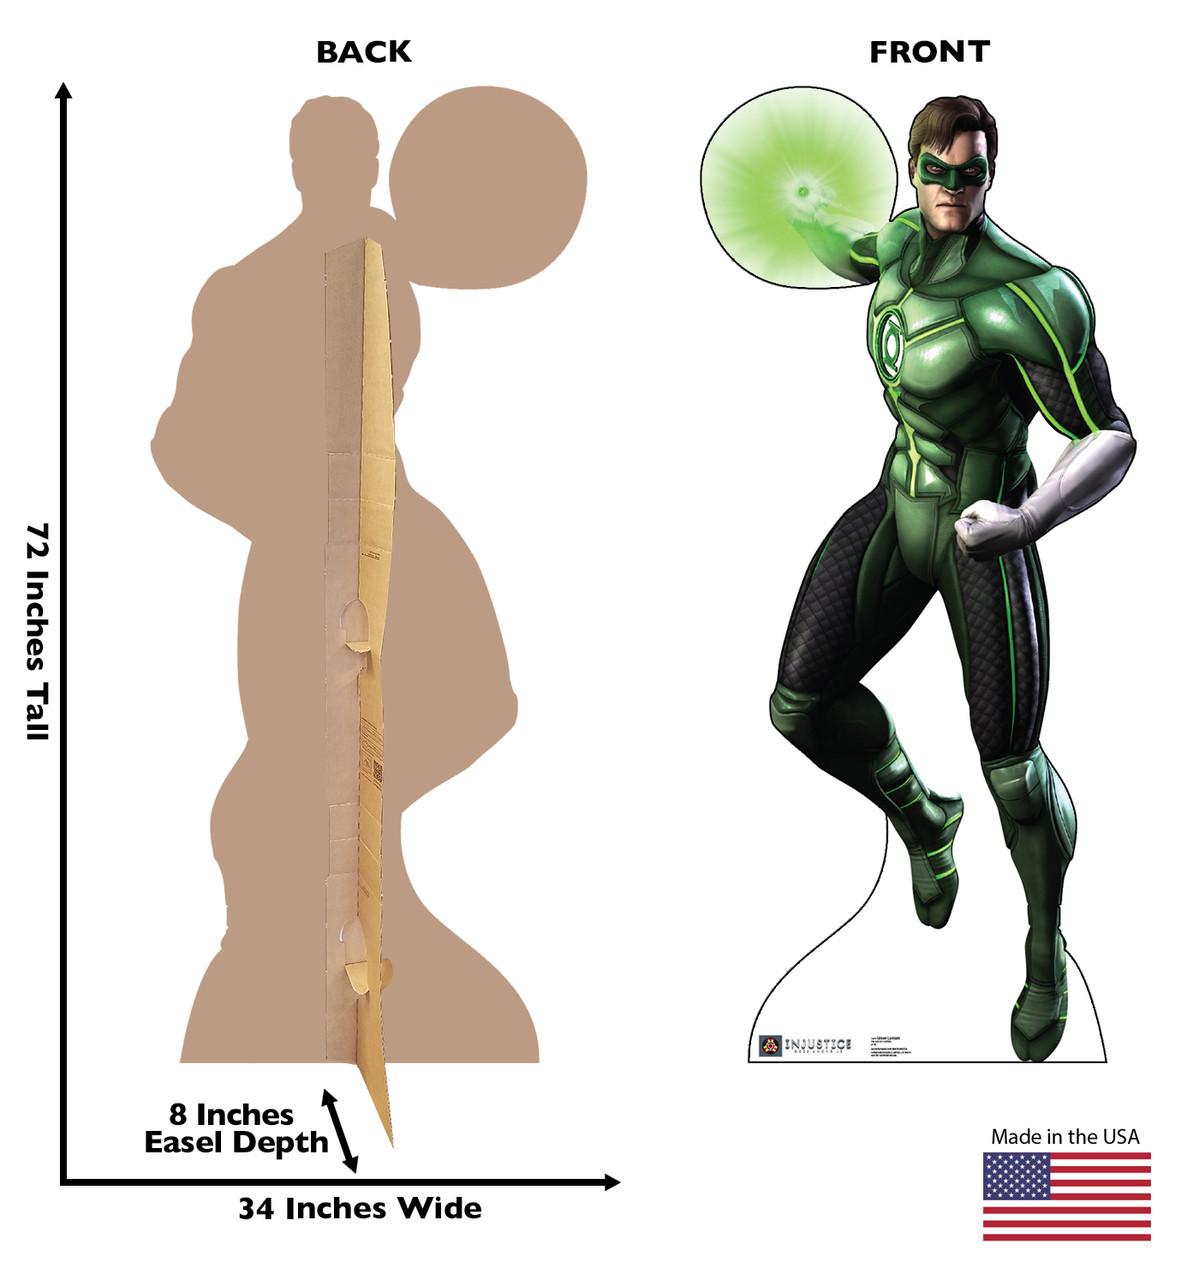 Life-size Green Lantern - Injustice Gods Among Us Cardboard Standup | Cardboard Cutout